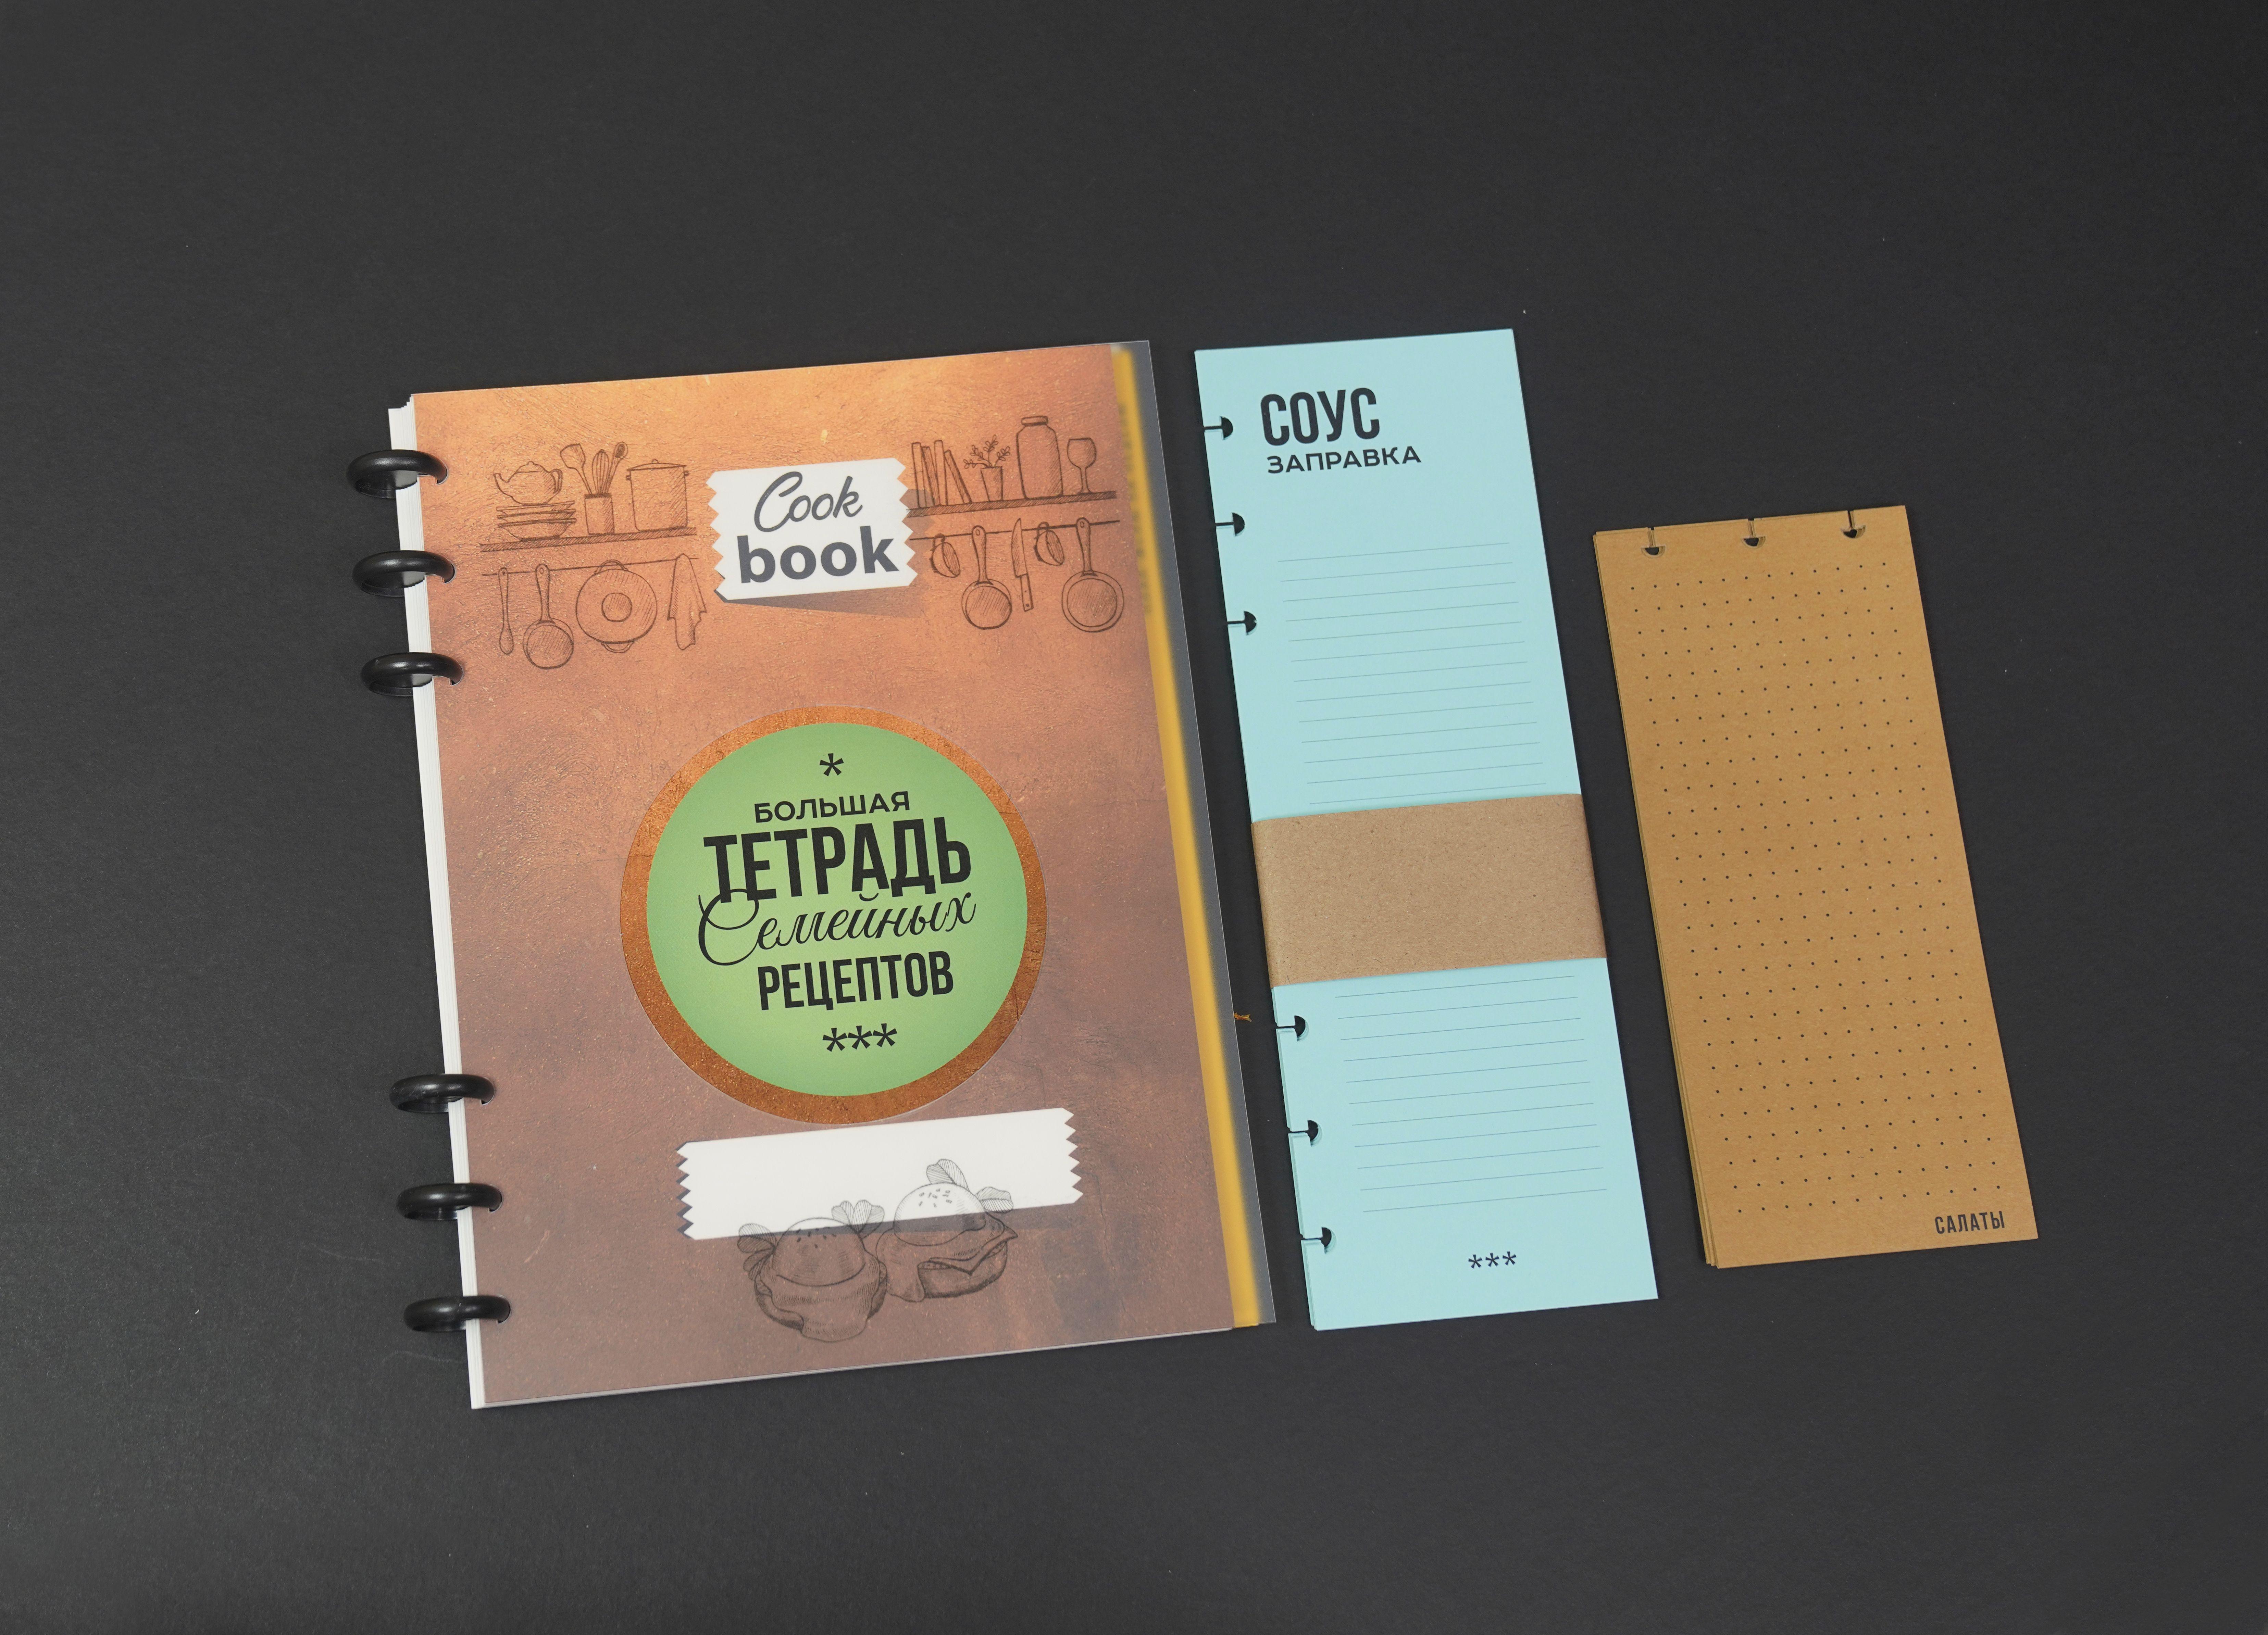 Тетрадь для записи рецептов